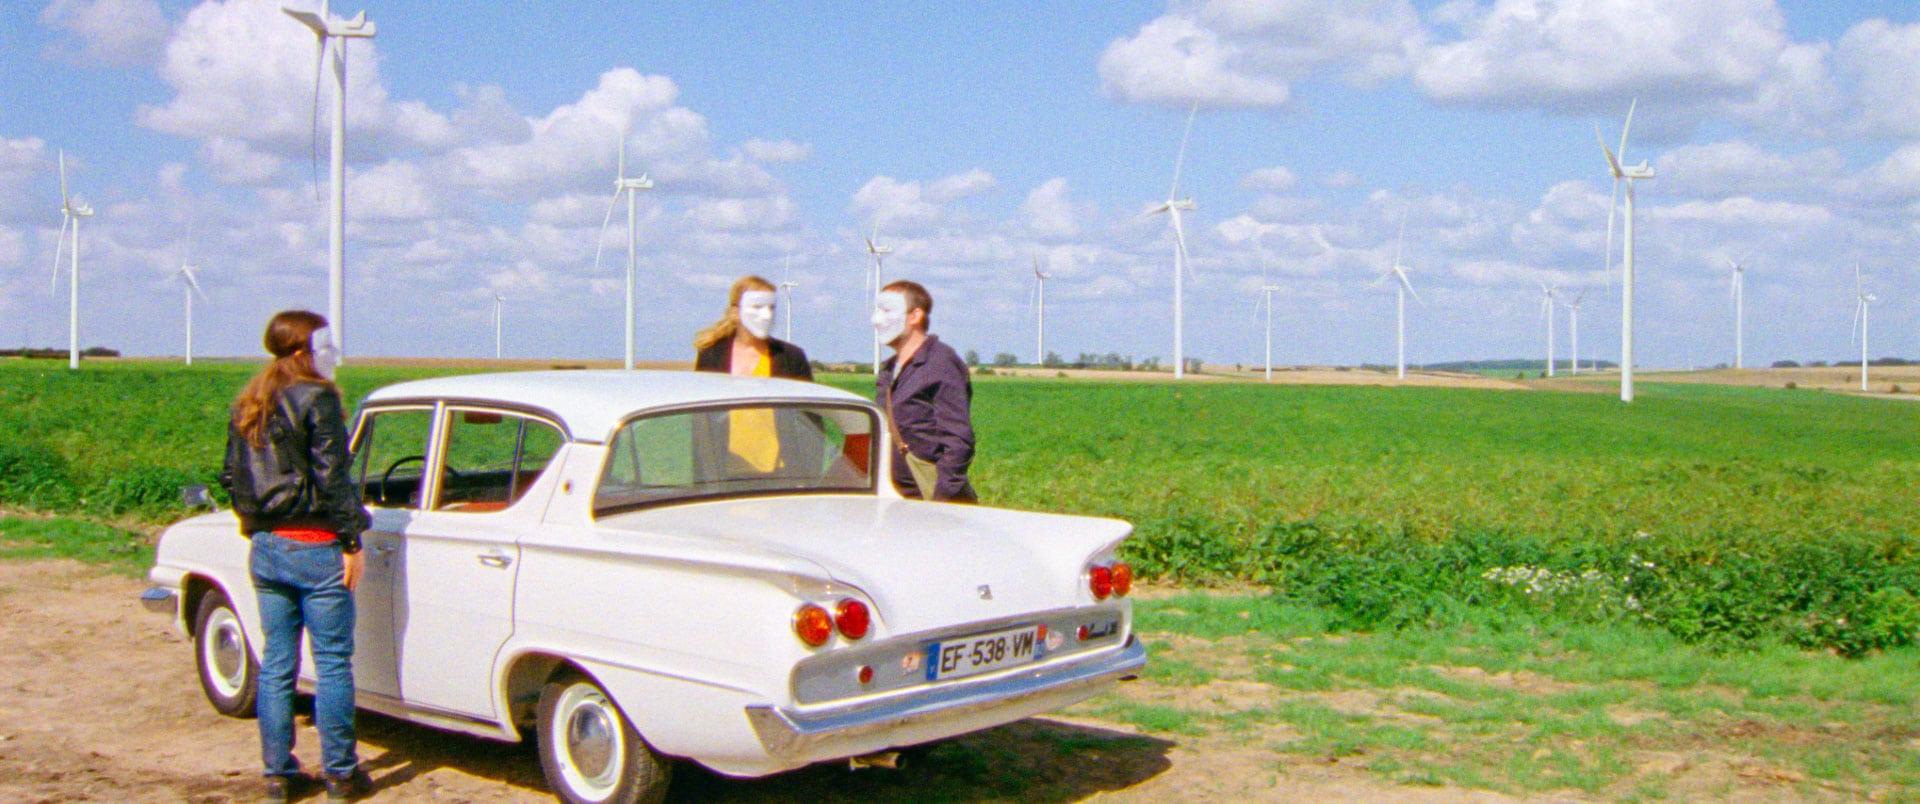 Imprevisti digitalirecensione film di Benoît Delépine e Gustave Kervern